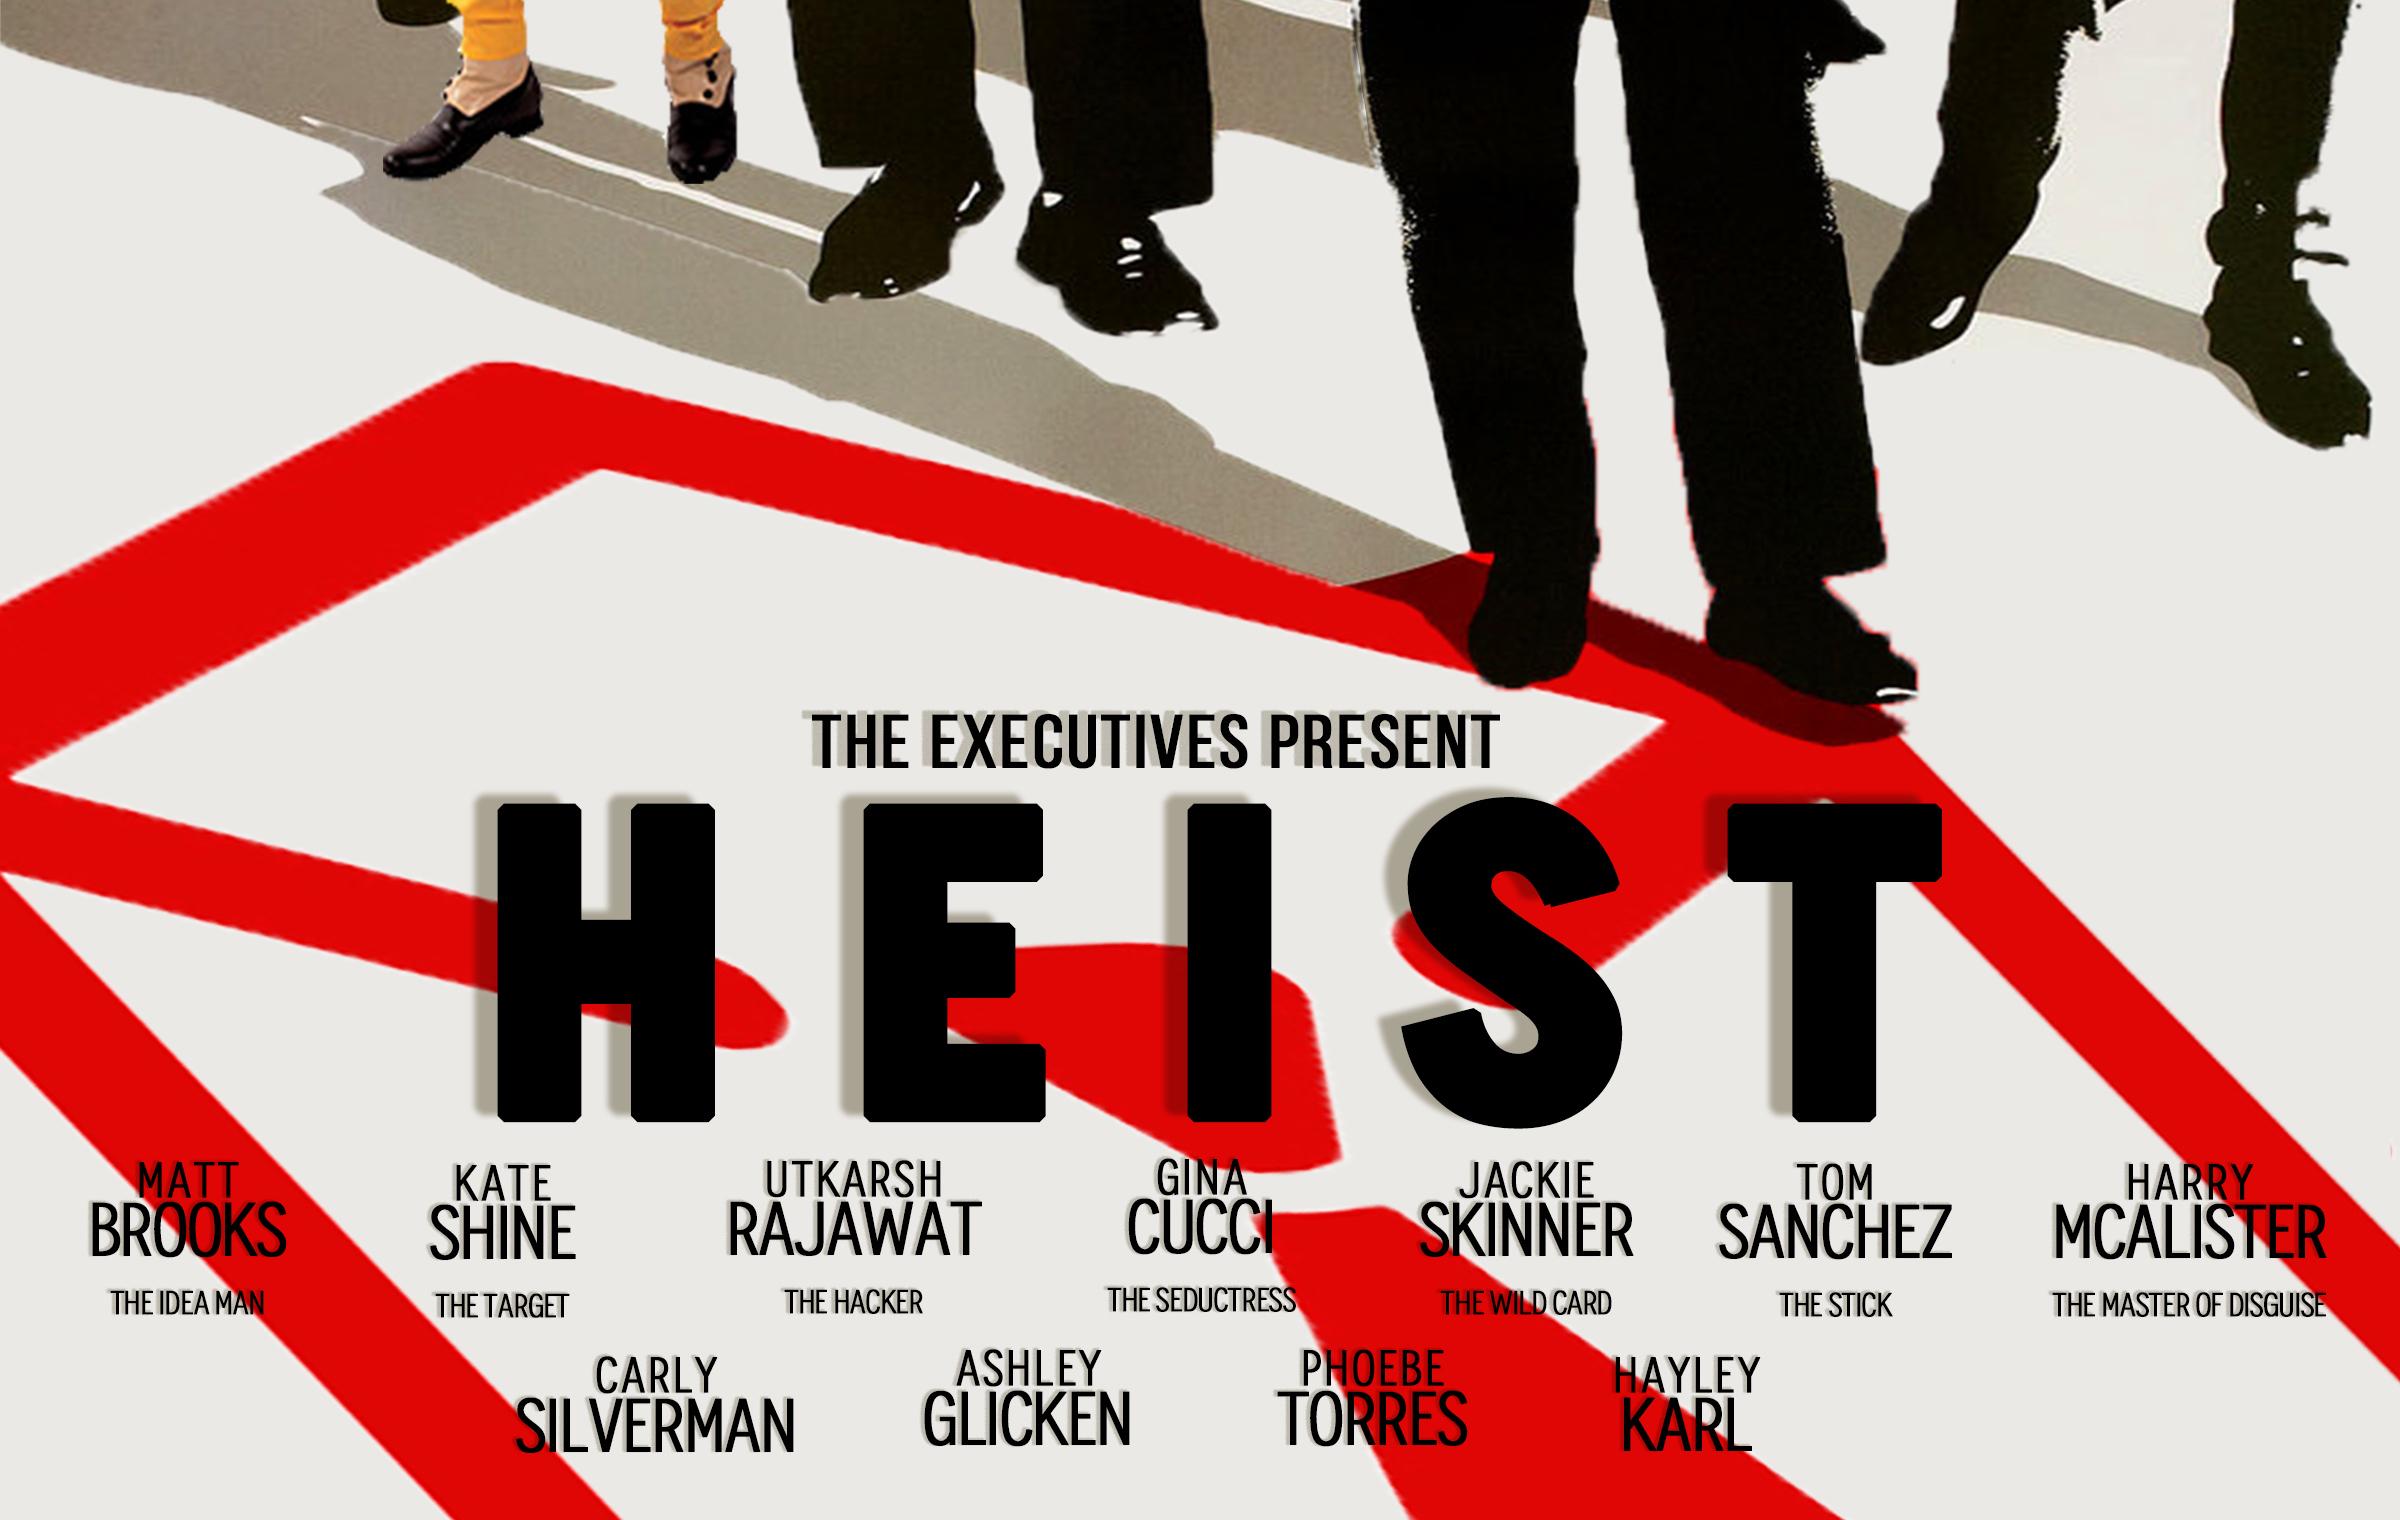 The Executives Present: HEIST!